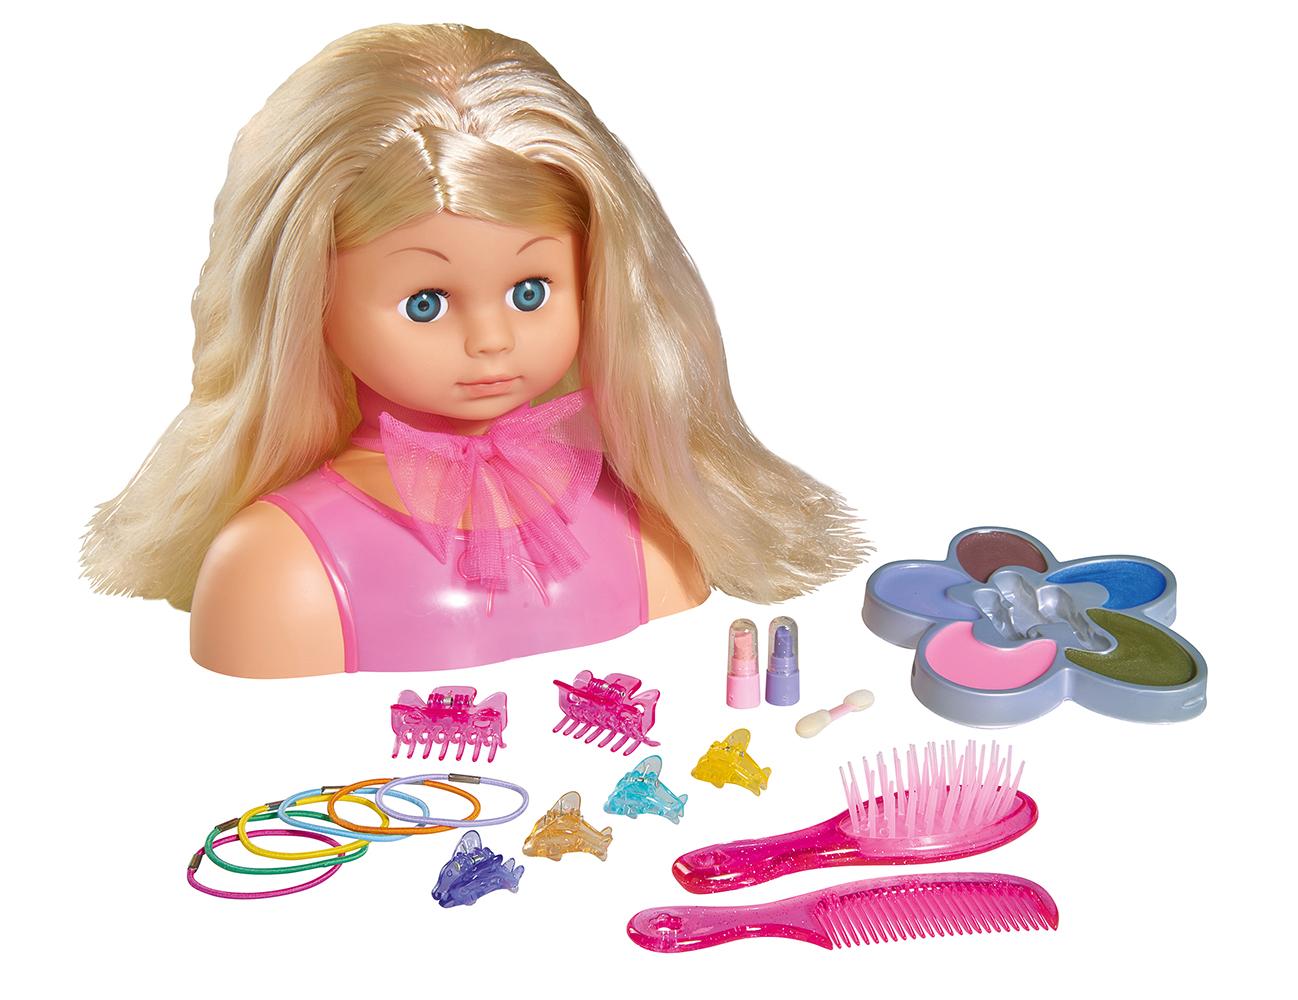 Steffi Love - Tête à coiffer 25 cm